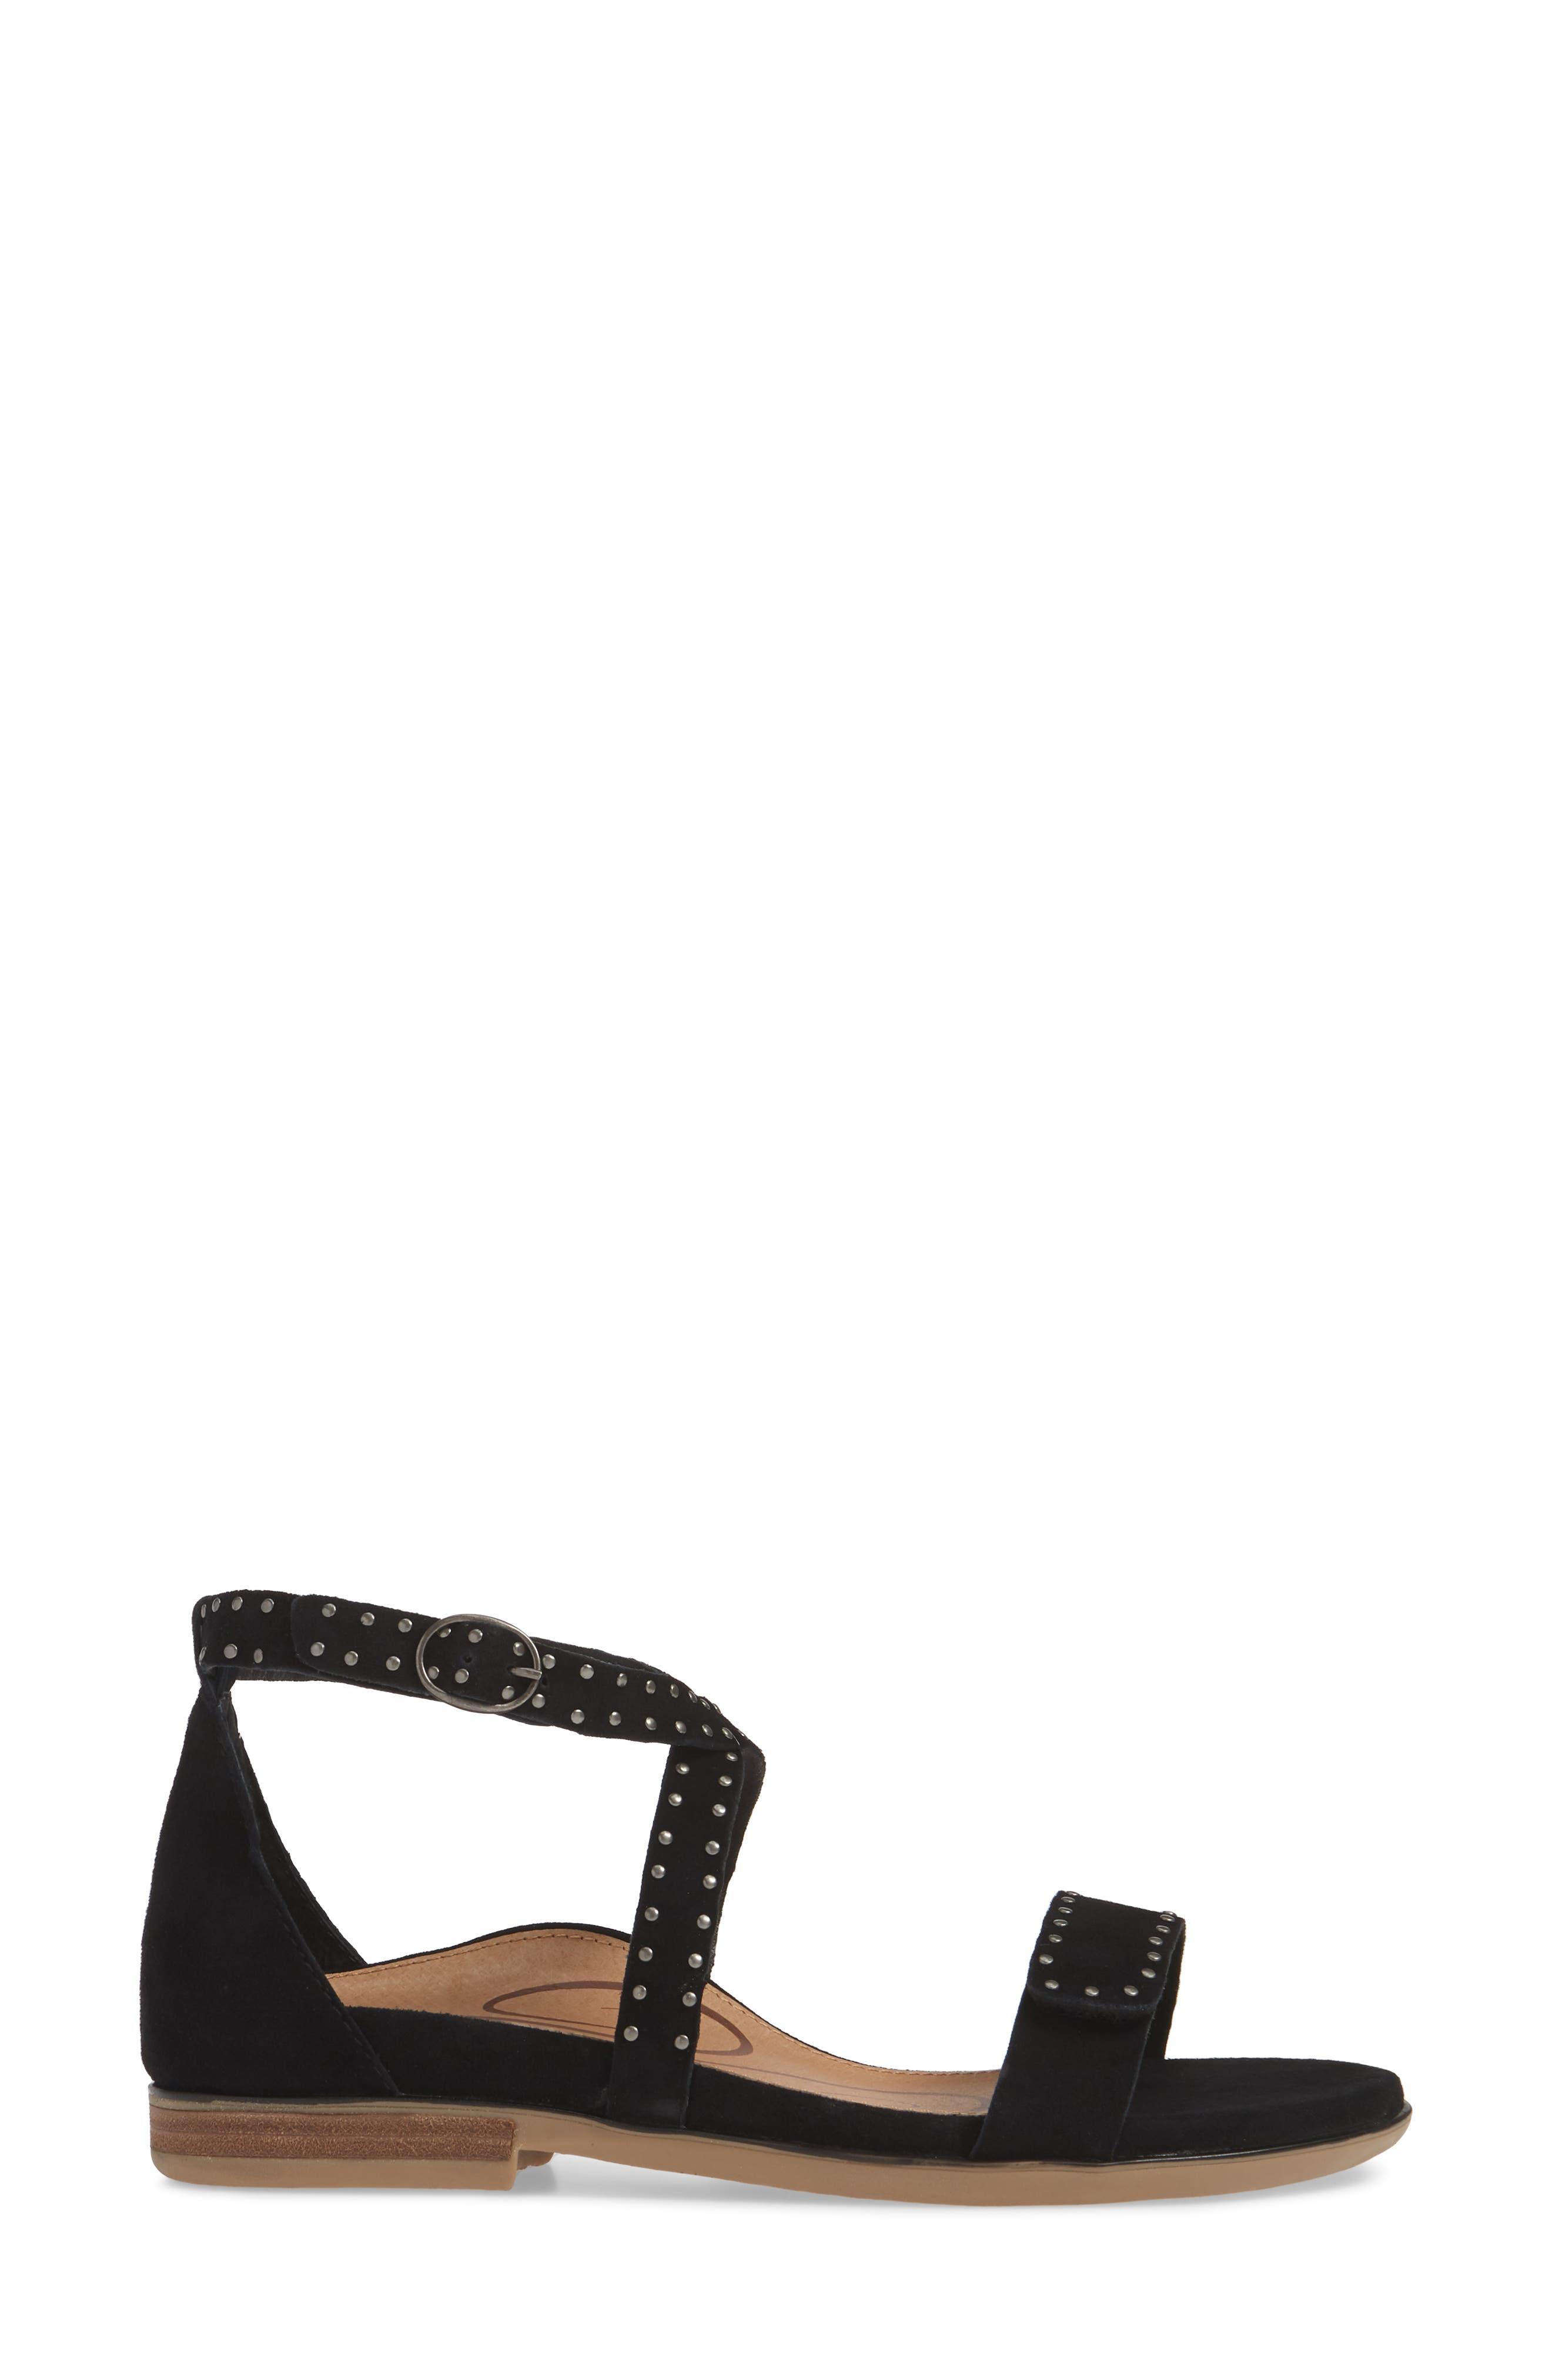 AETREX, Hailey Studded Sandal, Alternate thumbnail 3, color, BLACK SUEDE